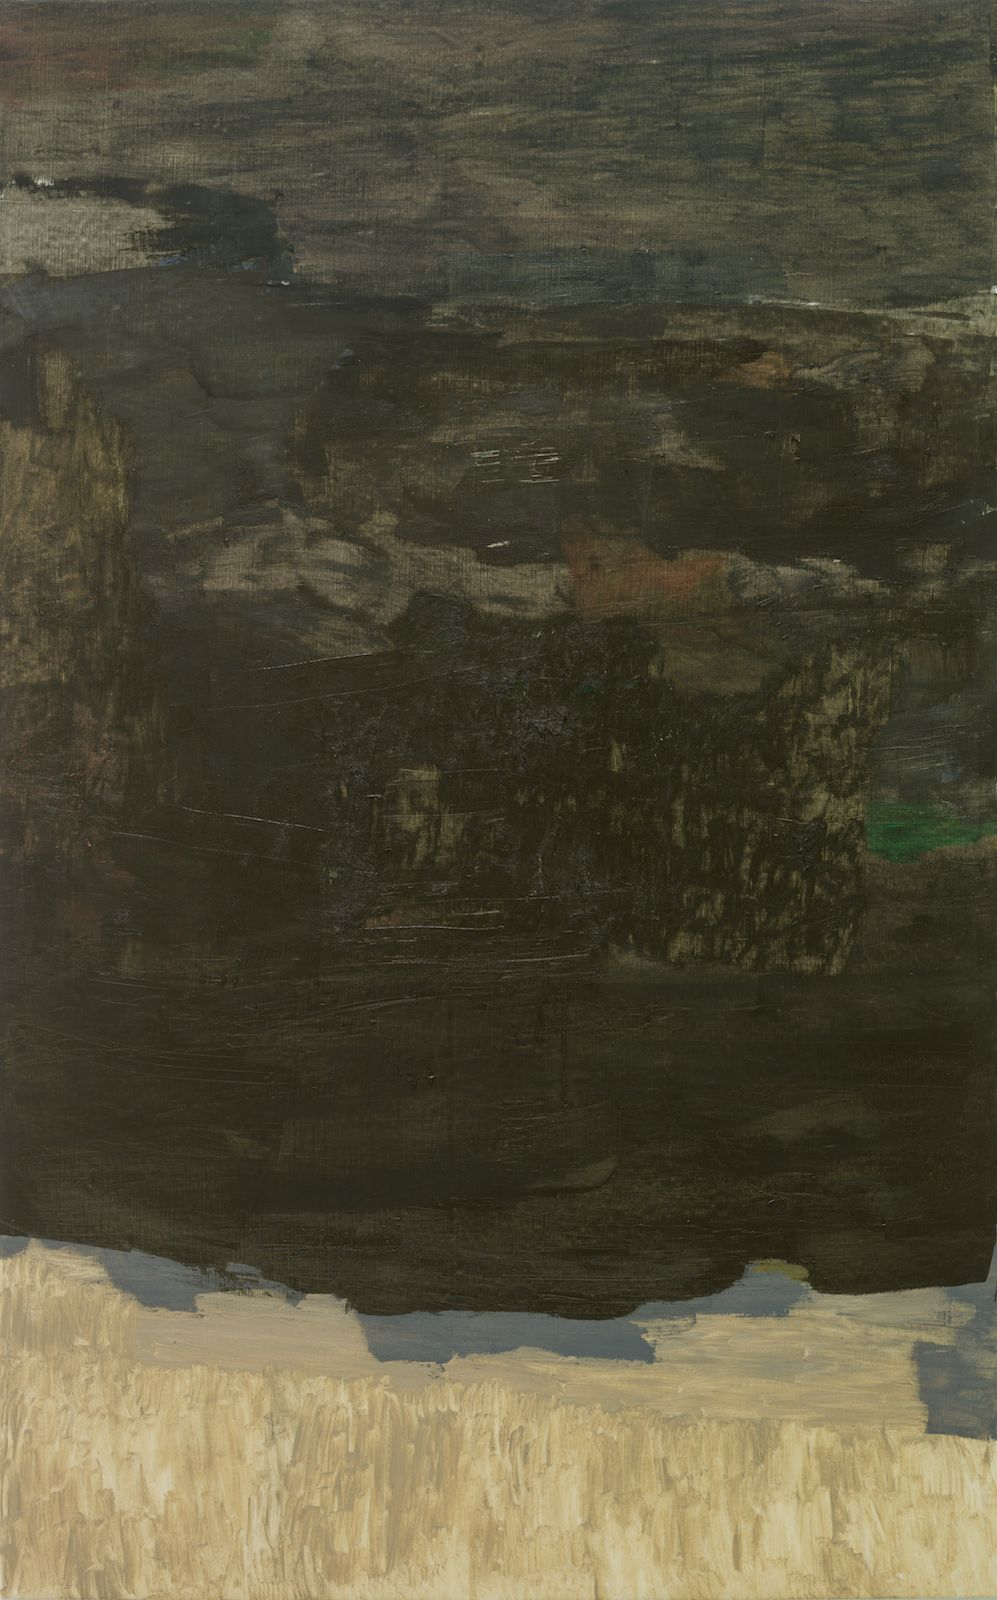 Itaipu, 2014-2015, oil on canvas, 200 x 125 cm